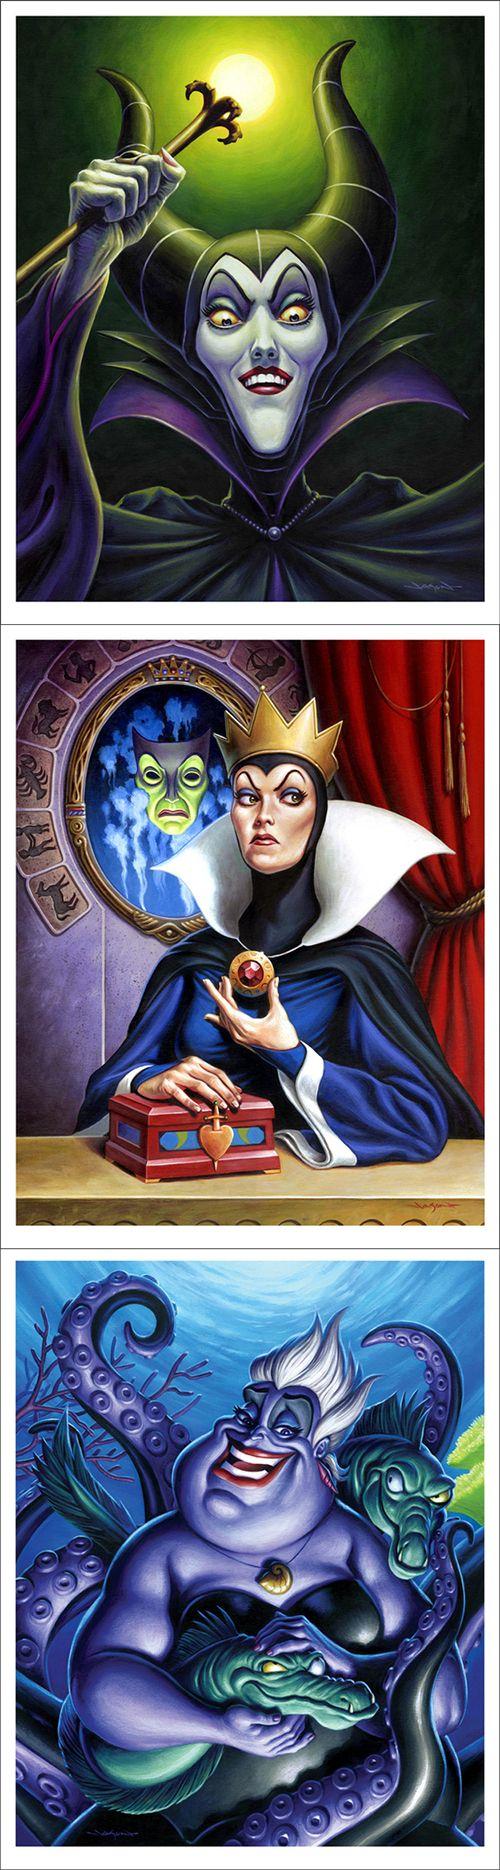 Disney Villains by artist Jason Edmiston